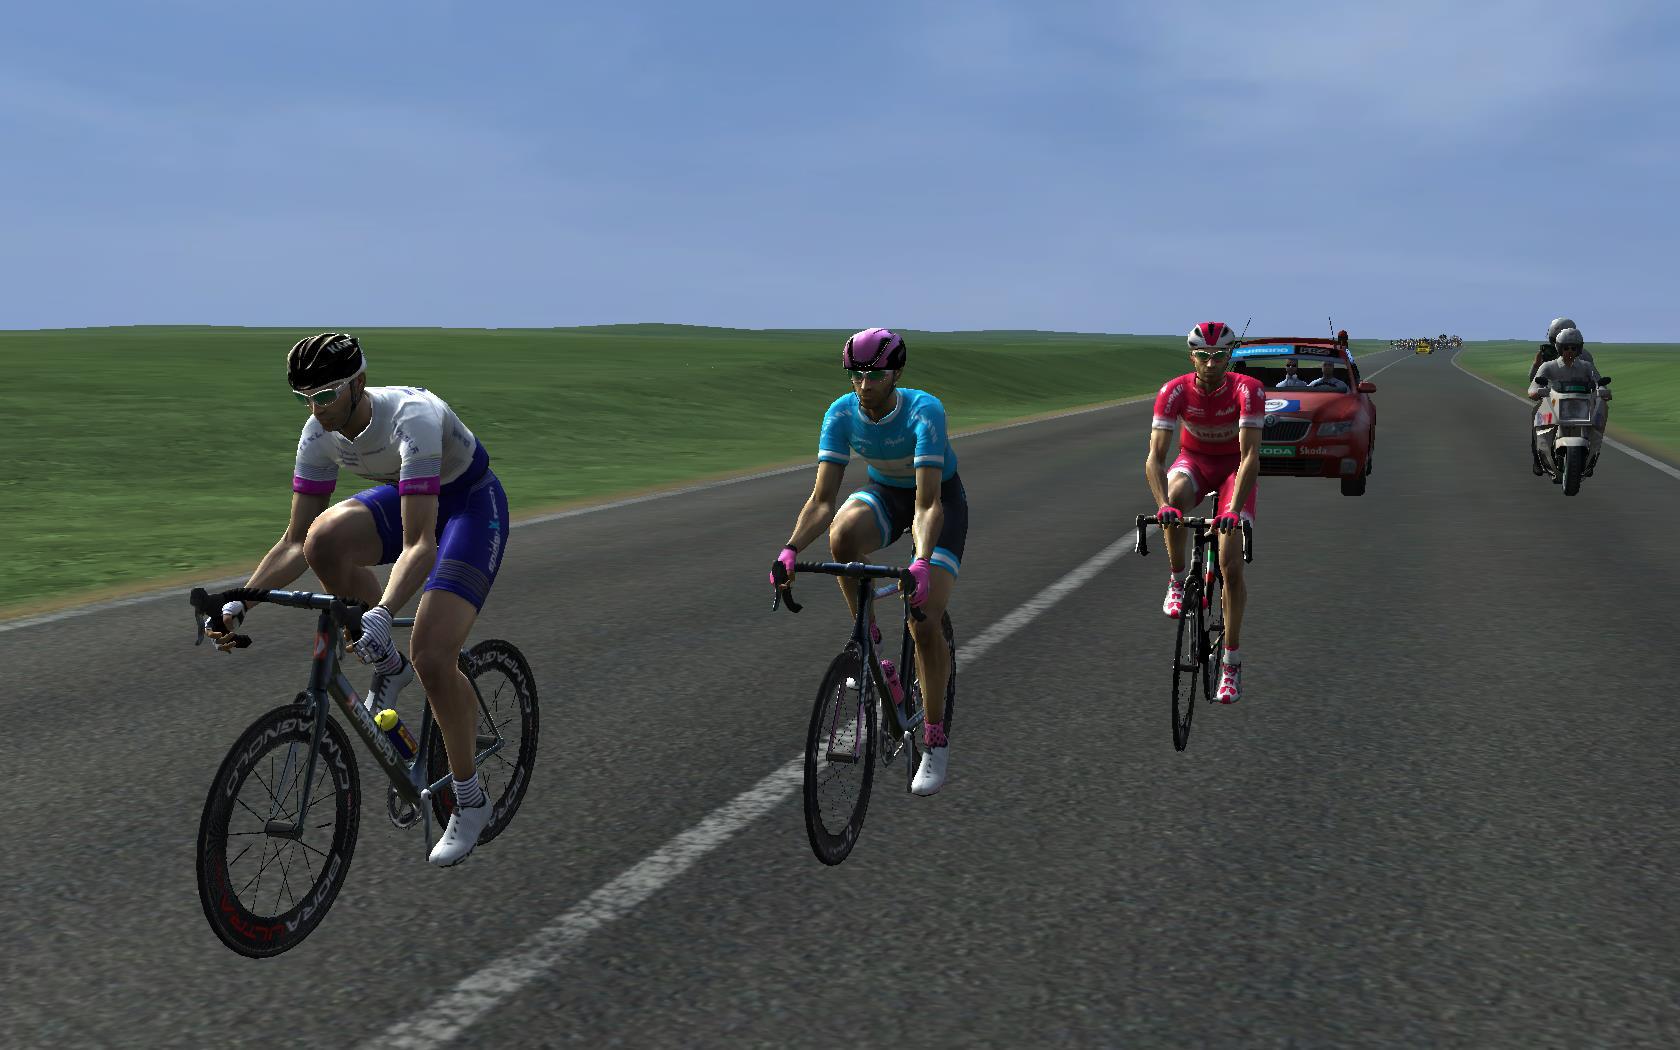 pcmdaily.com/images/mg/2018/Races/C2/USAPCC/1/PCM0006.jpg